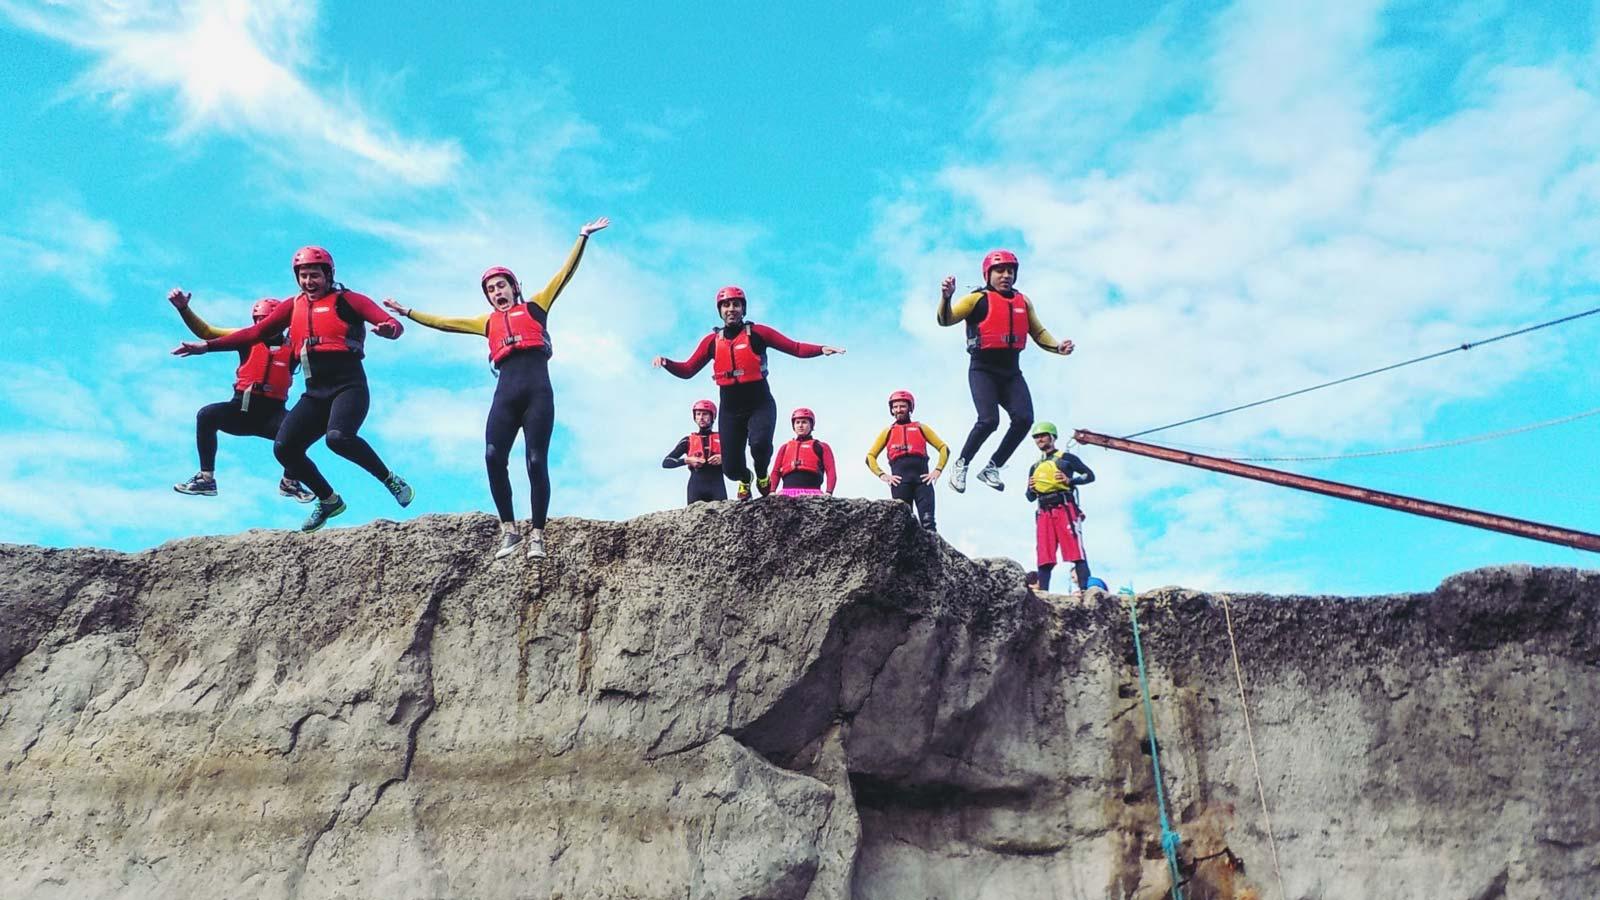 adventure4all-group-coasteering-jumping